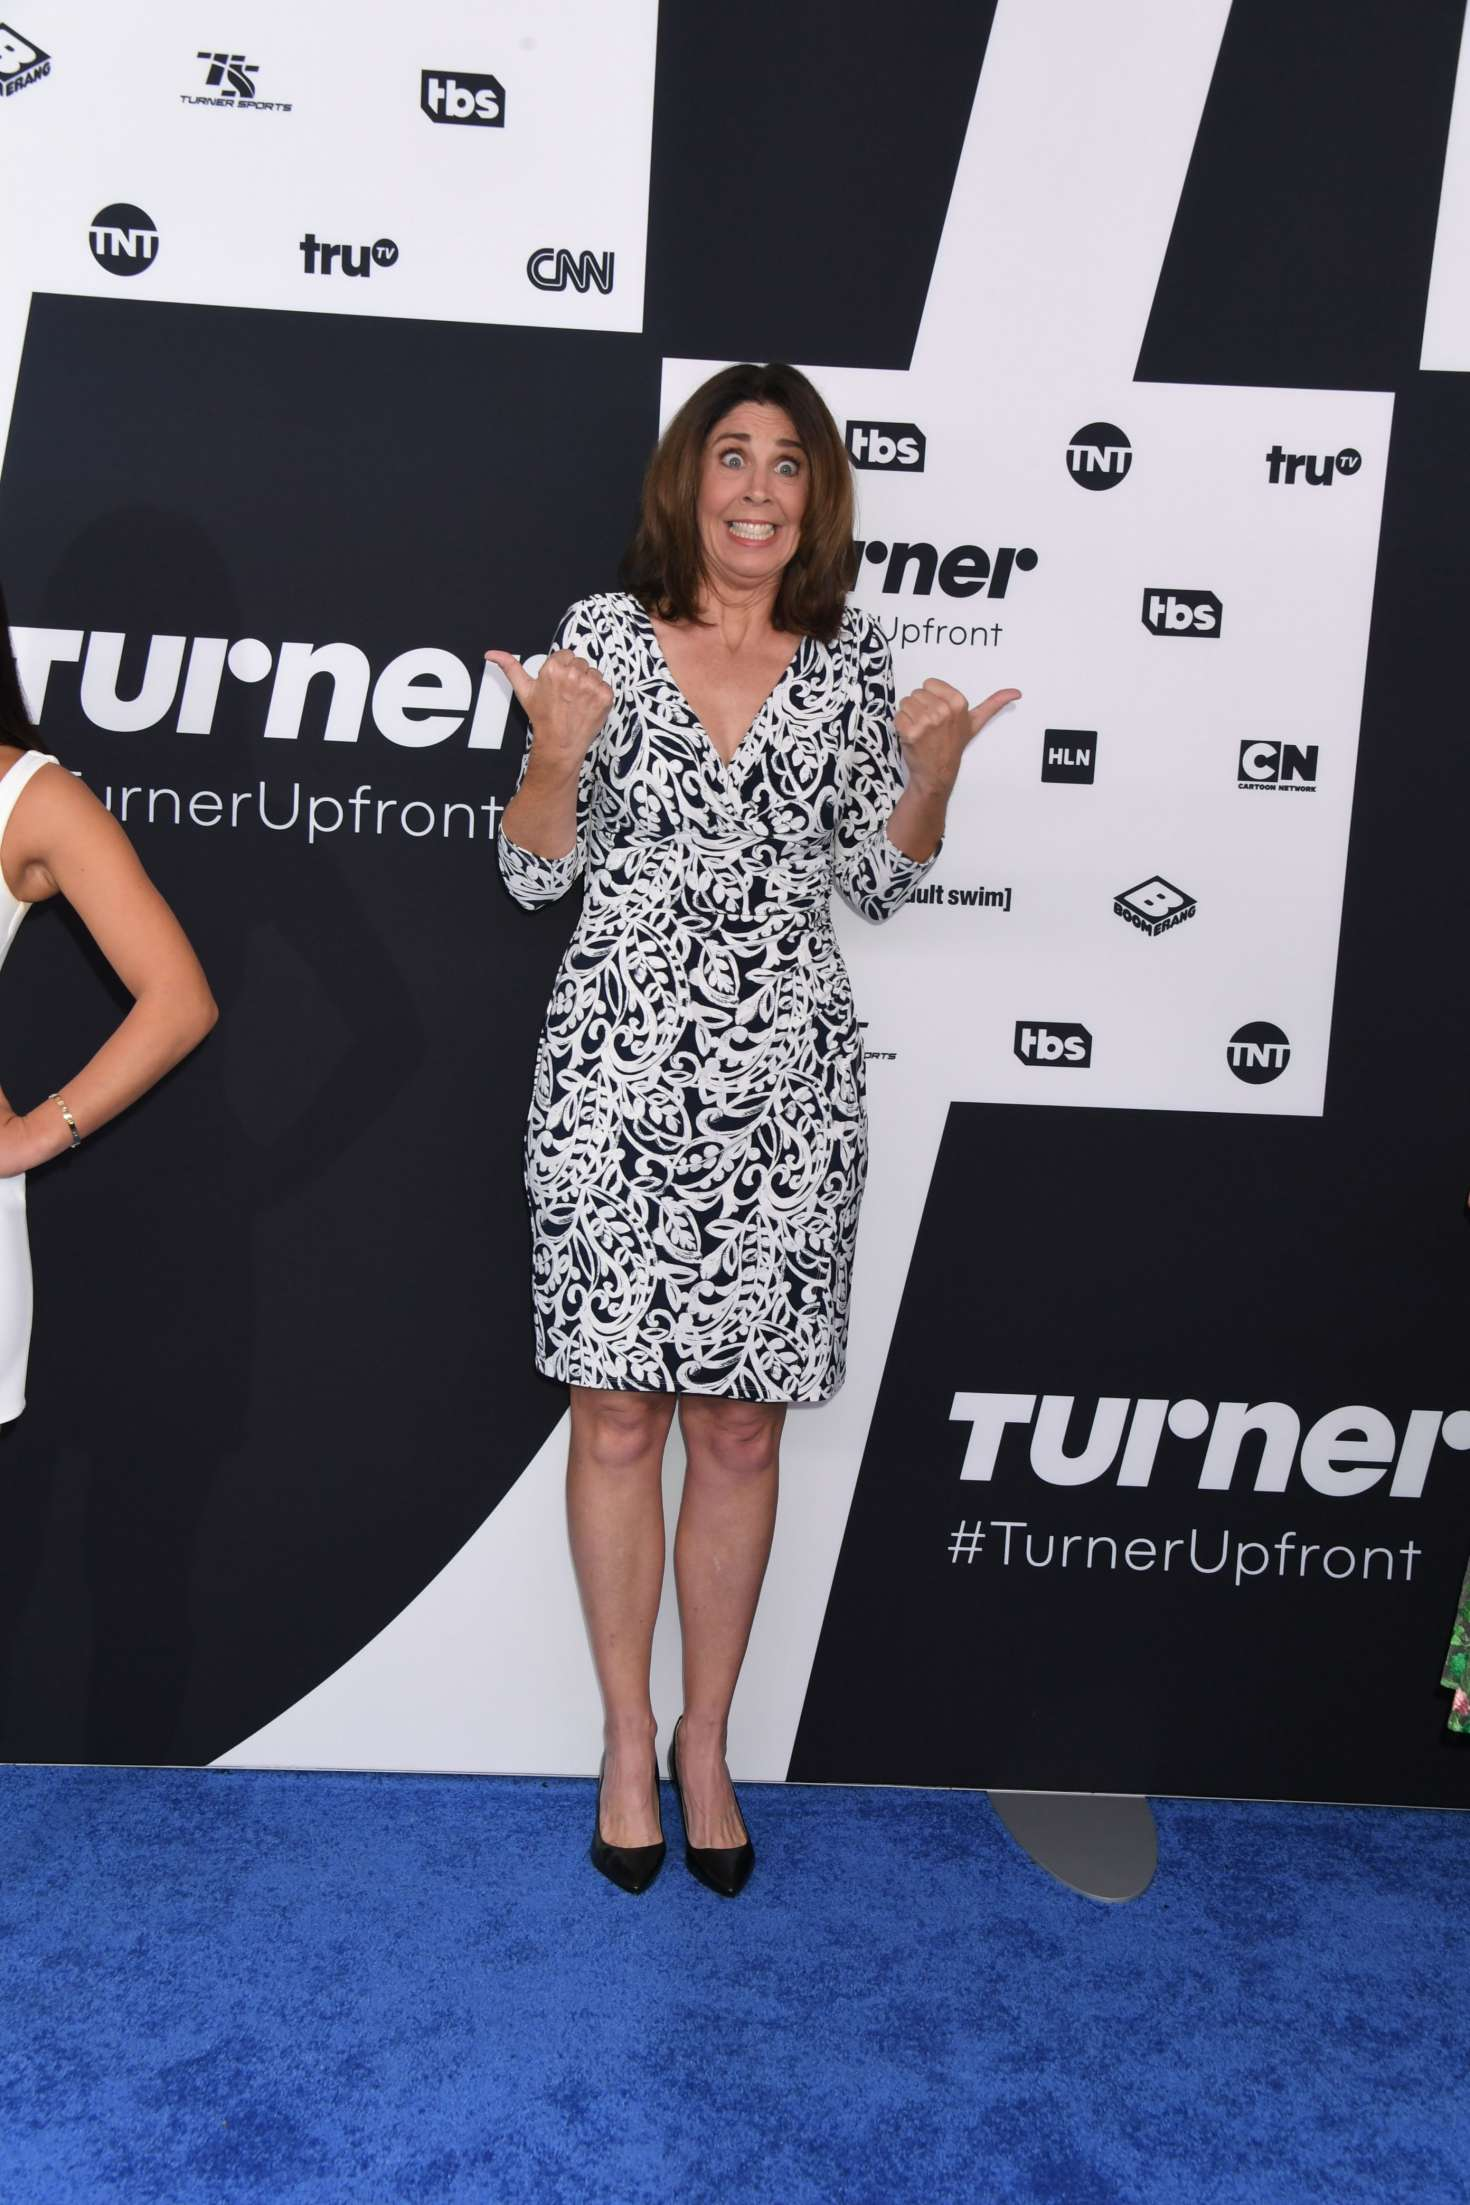 Brooke Dillman 2017 : Brooke Dillman: Turner Upfront Presentation -11